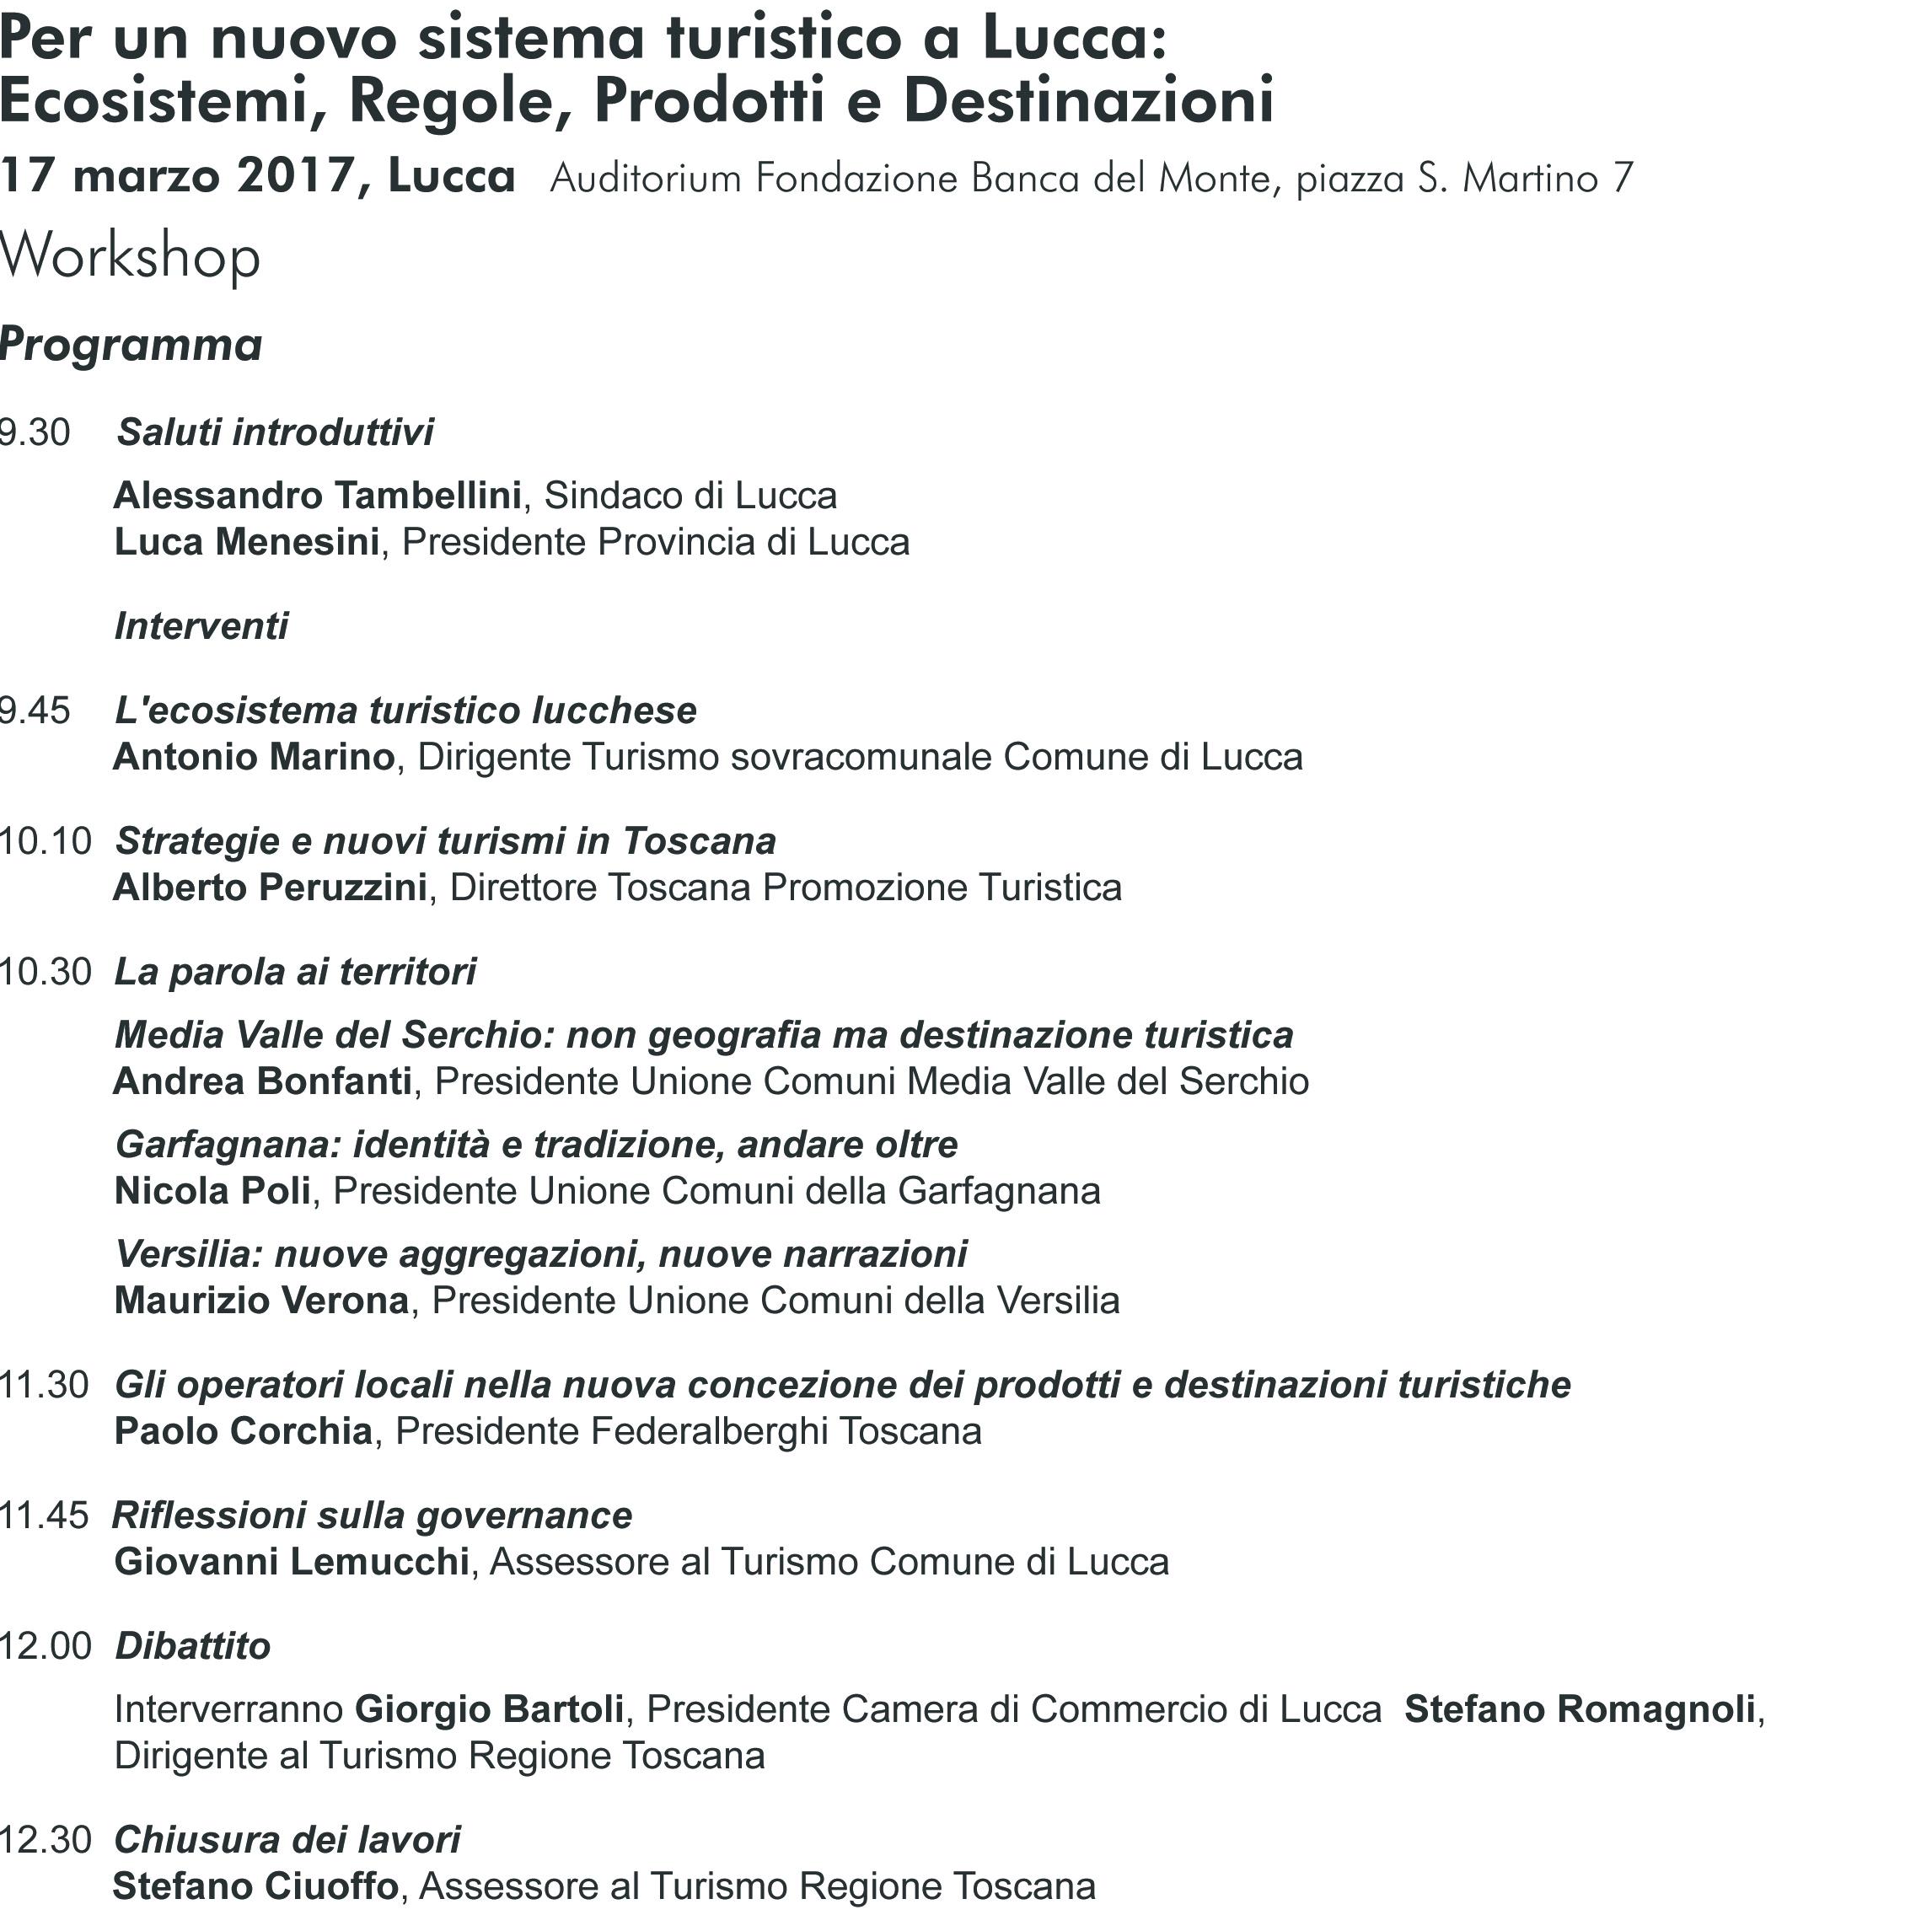 Programma Workshop Lucca Turismo